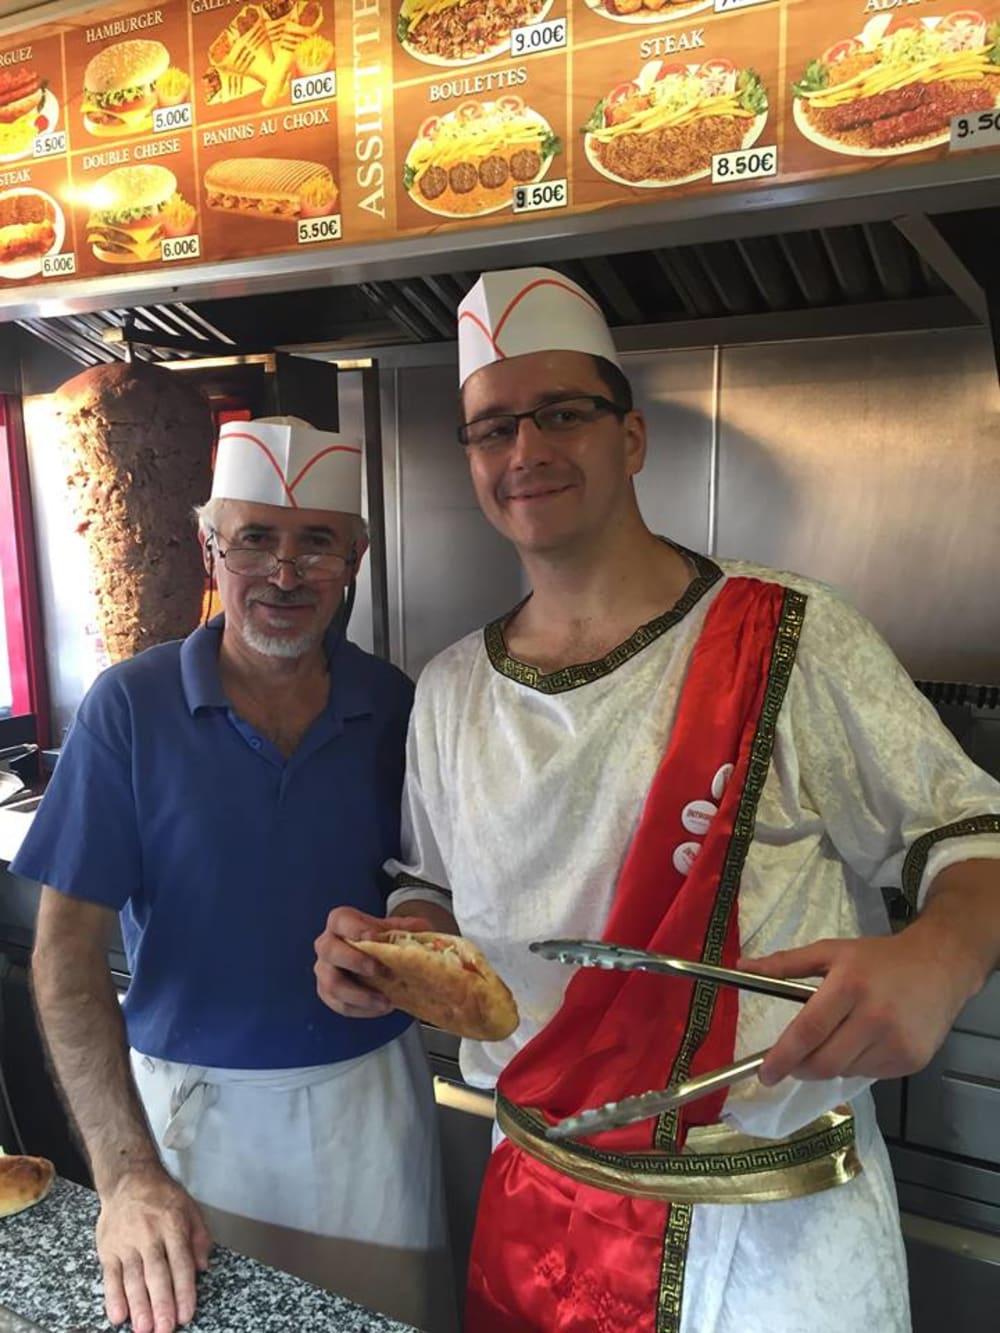 Mouffetard Faire son kebab 2 kebabs seulement